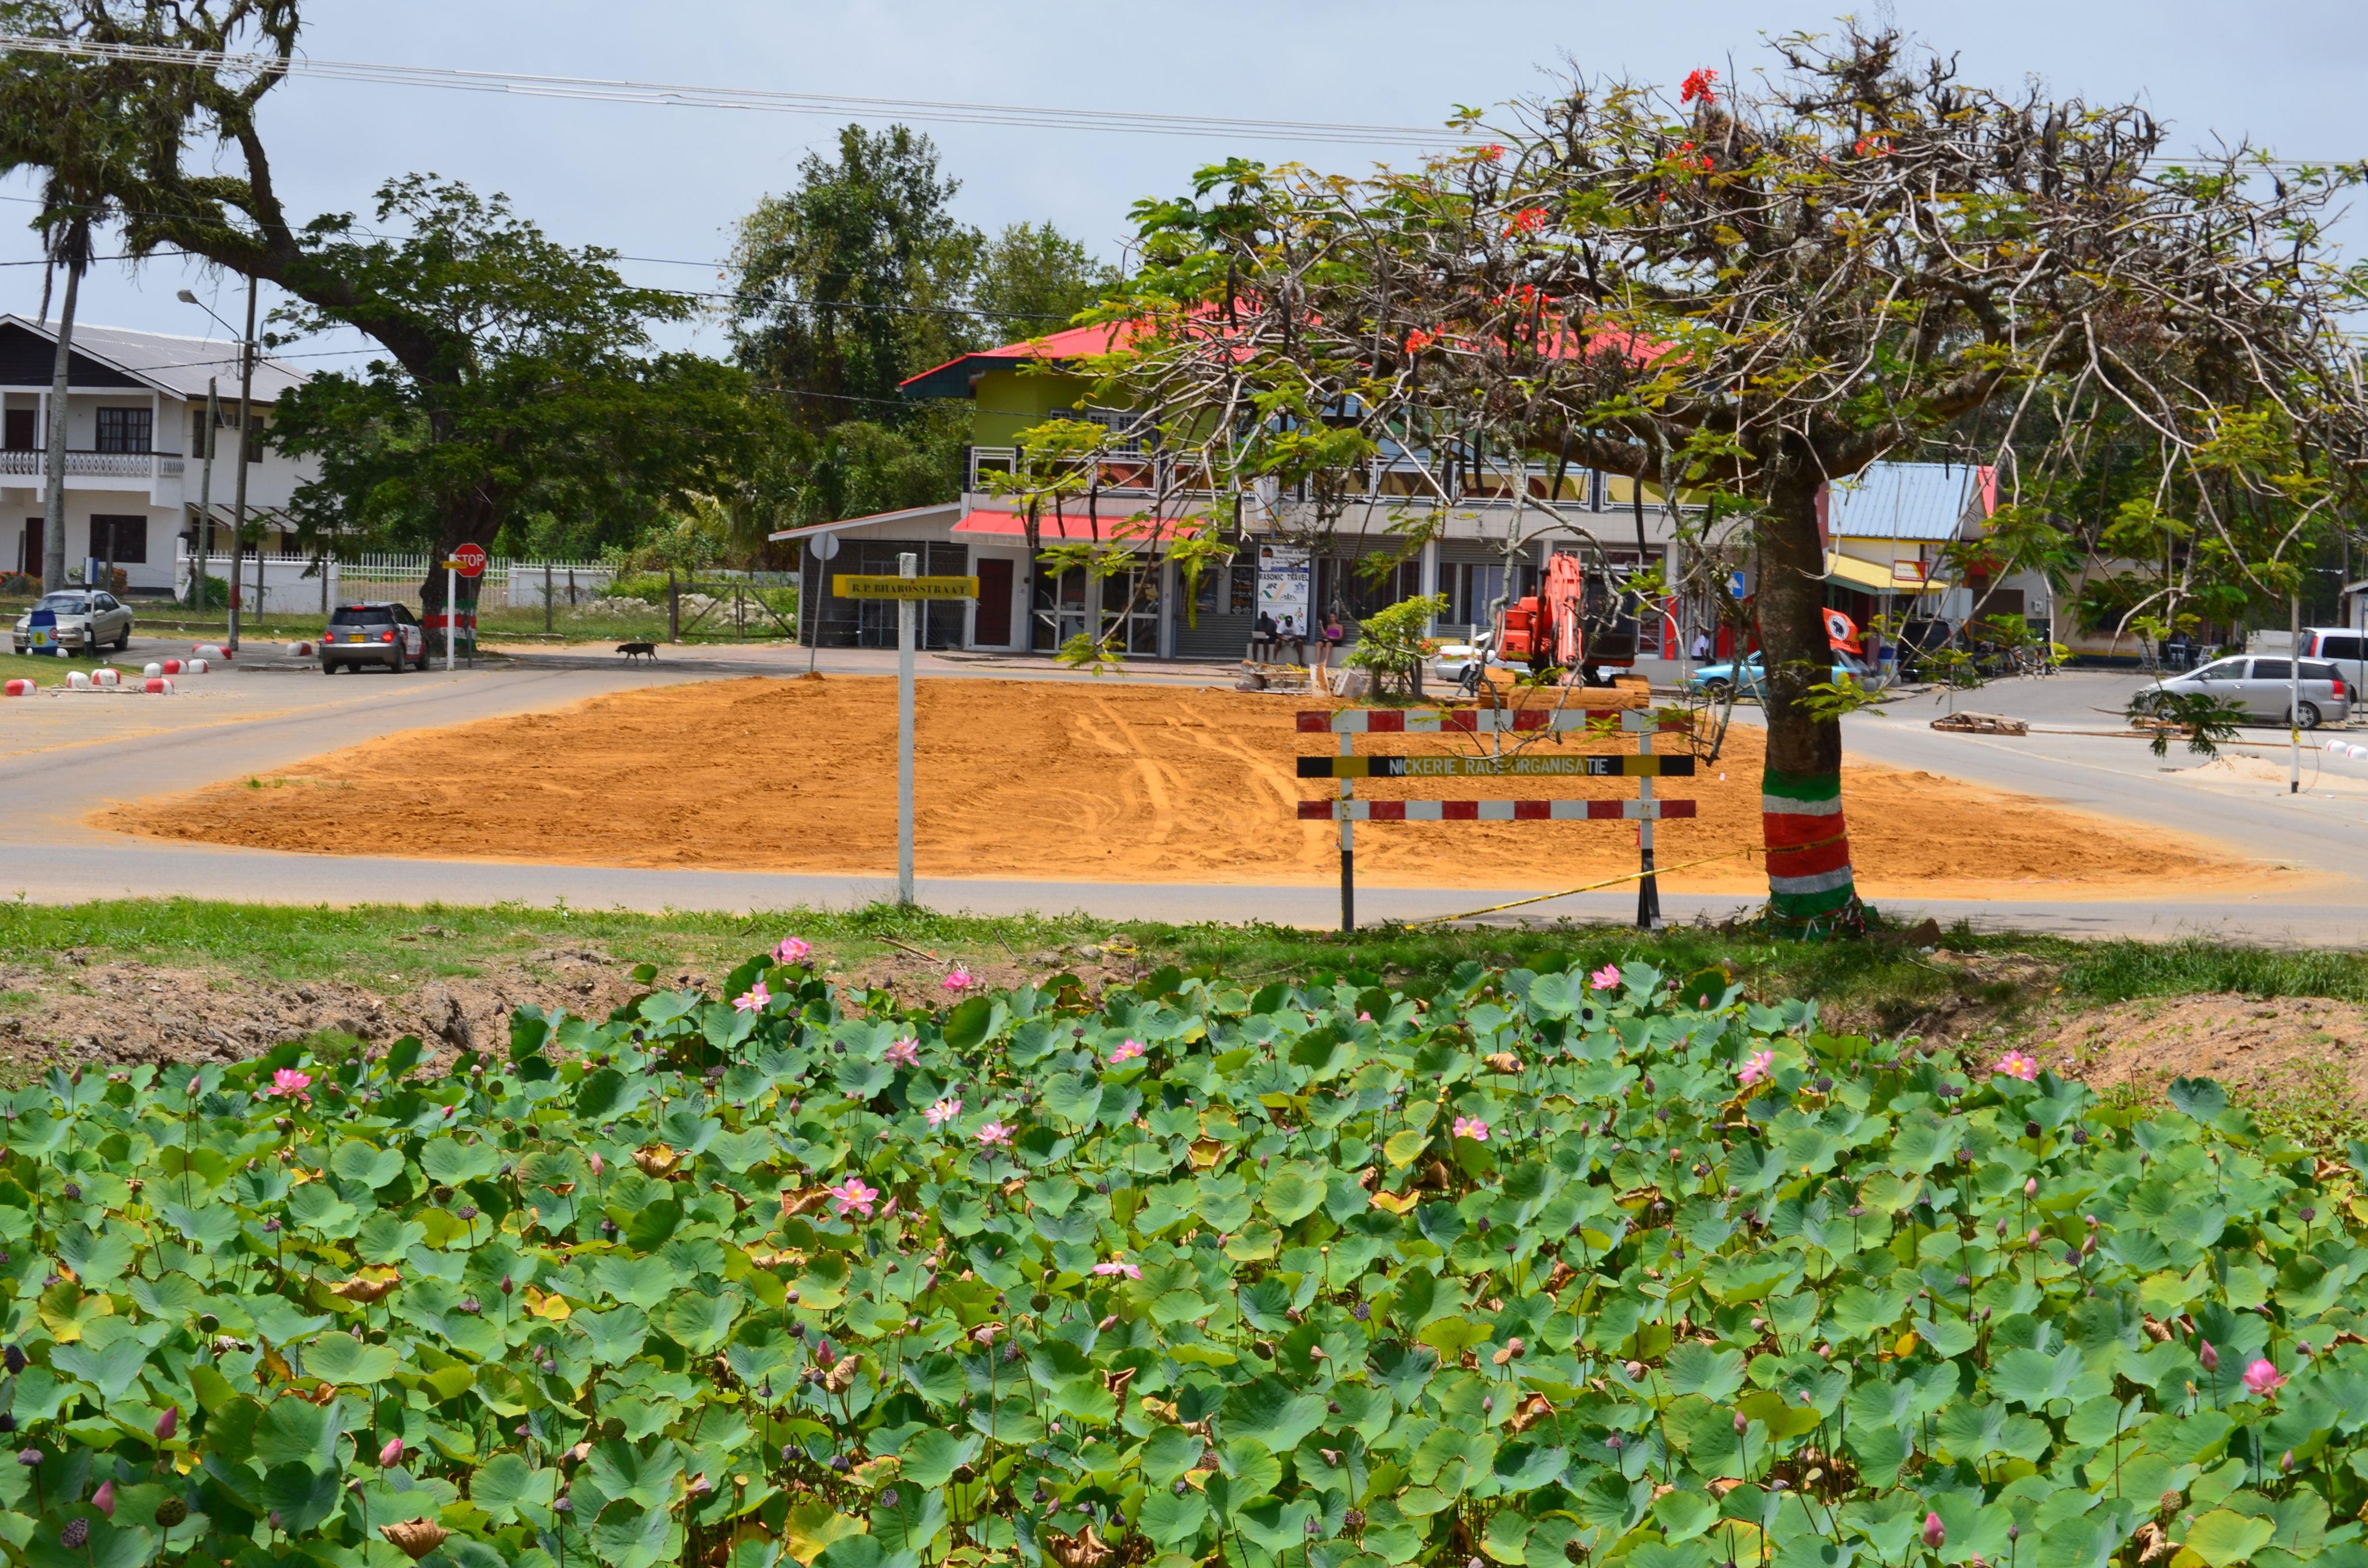 #Nickerie  #NieuwNickerie #Suriname #Surinam  #PhotoByEllyvanPel